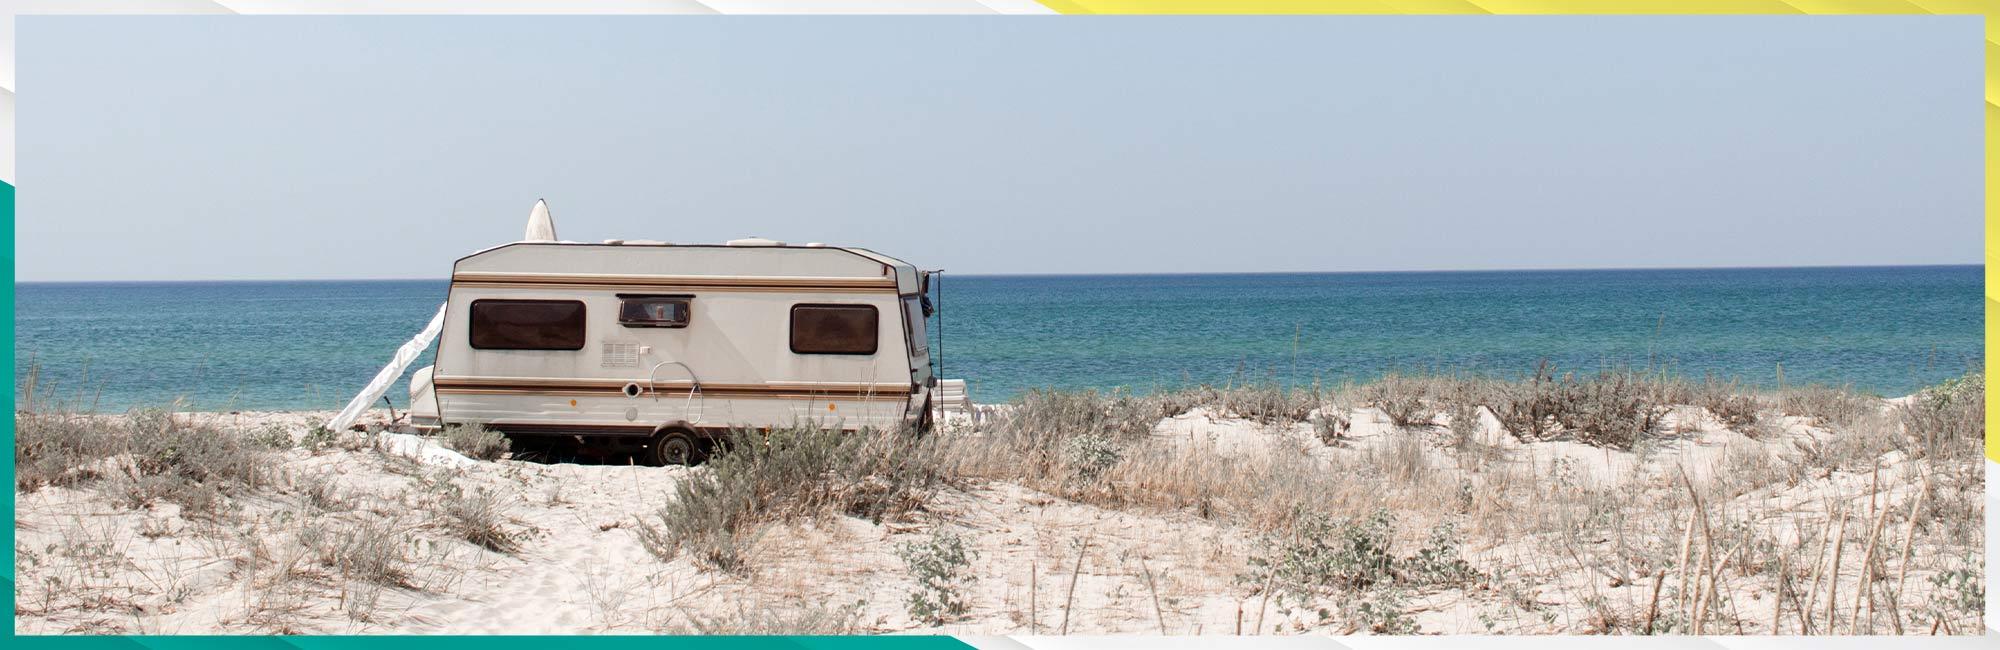 RV beach camping Eastern Shore MD